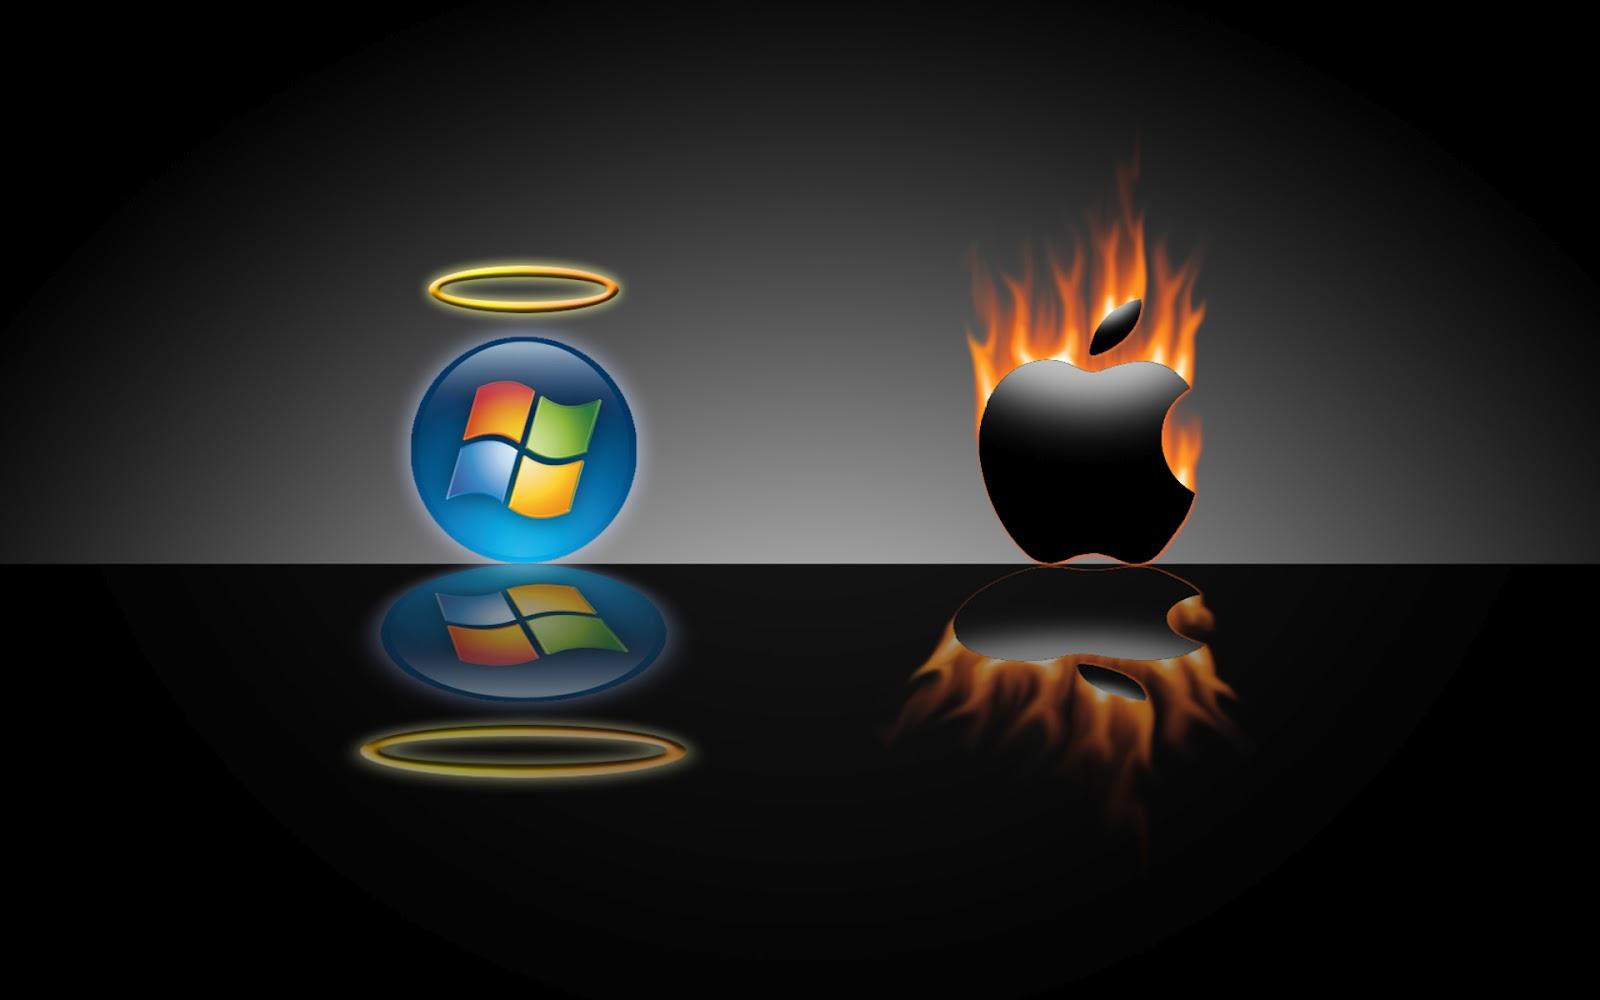 http://4.bp.blogspot.com/-1Iv2uHDL-l4/UDGWbacYr6I/AAAAAAAABkE/9tcdTbCRNzg/s1600/windows_vs_apple_by_nhratf-d3cjig7.jpg